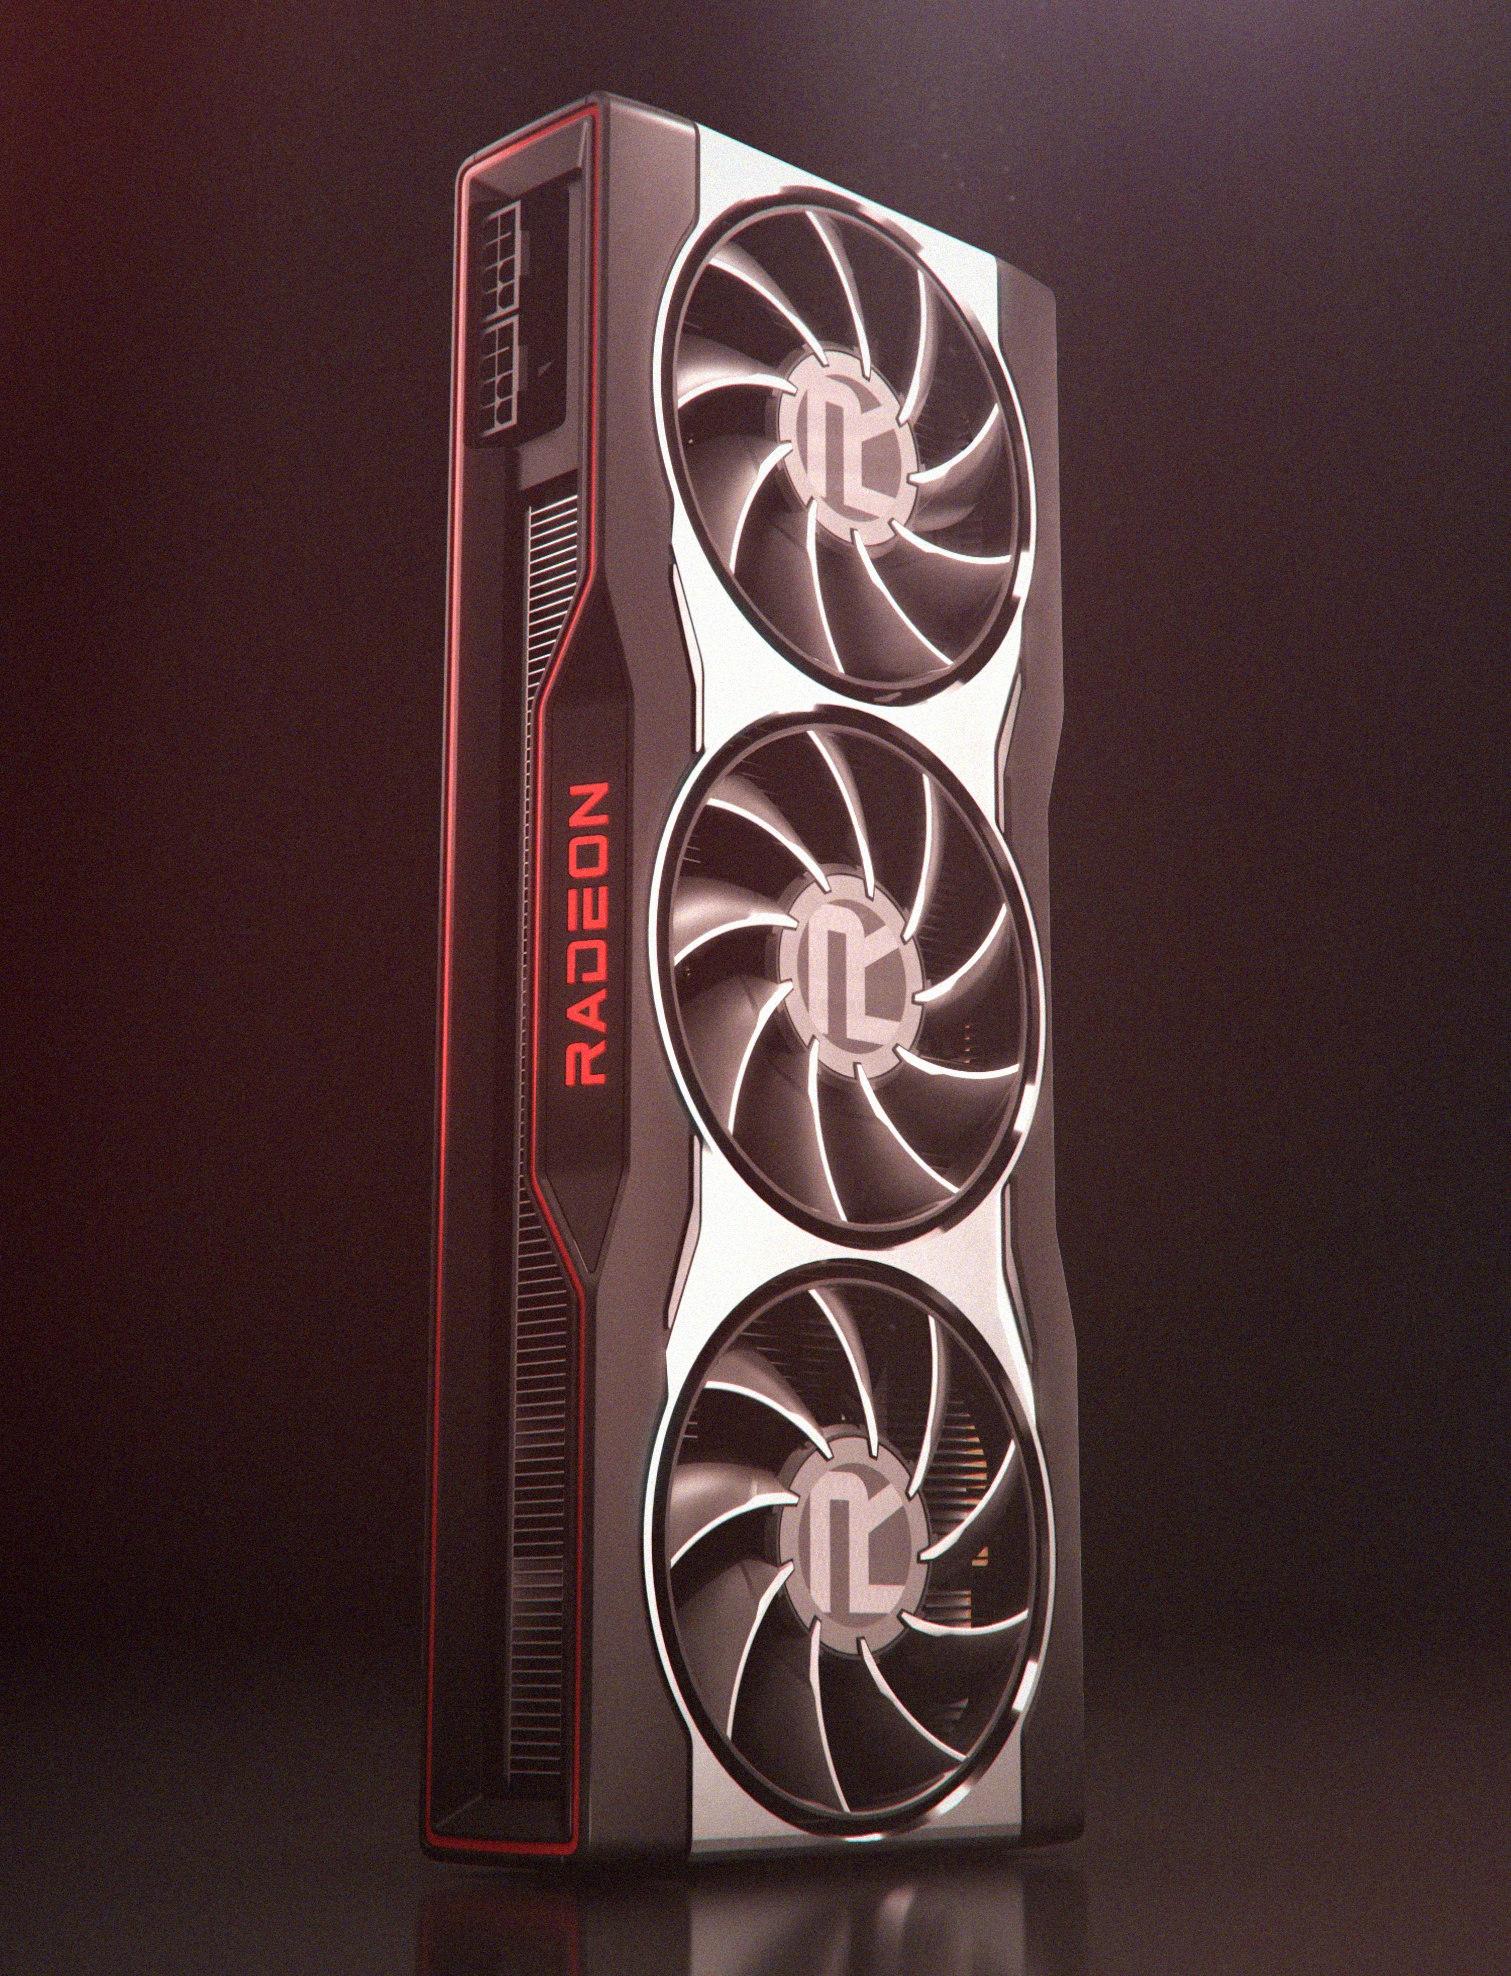 AMD_Radeon_RX_6000_Series_Graphics_Card.jpg